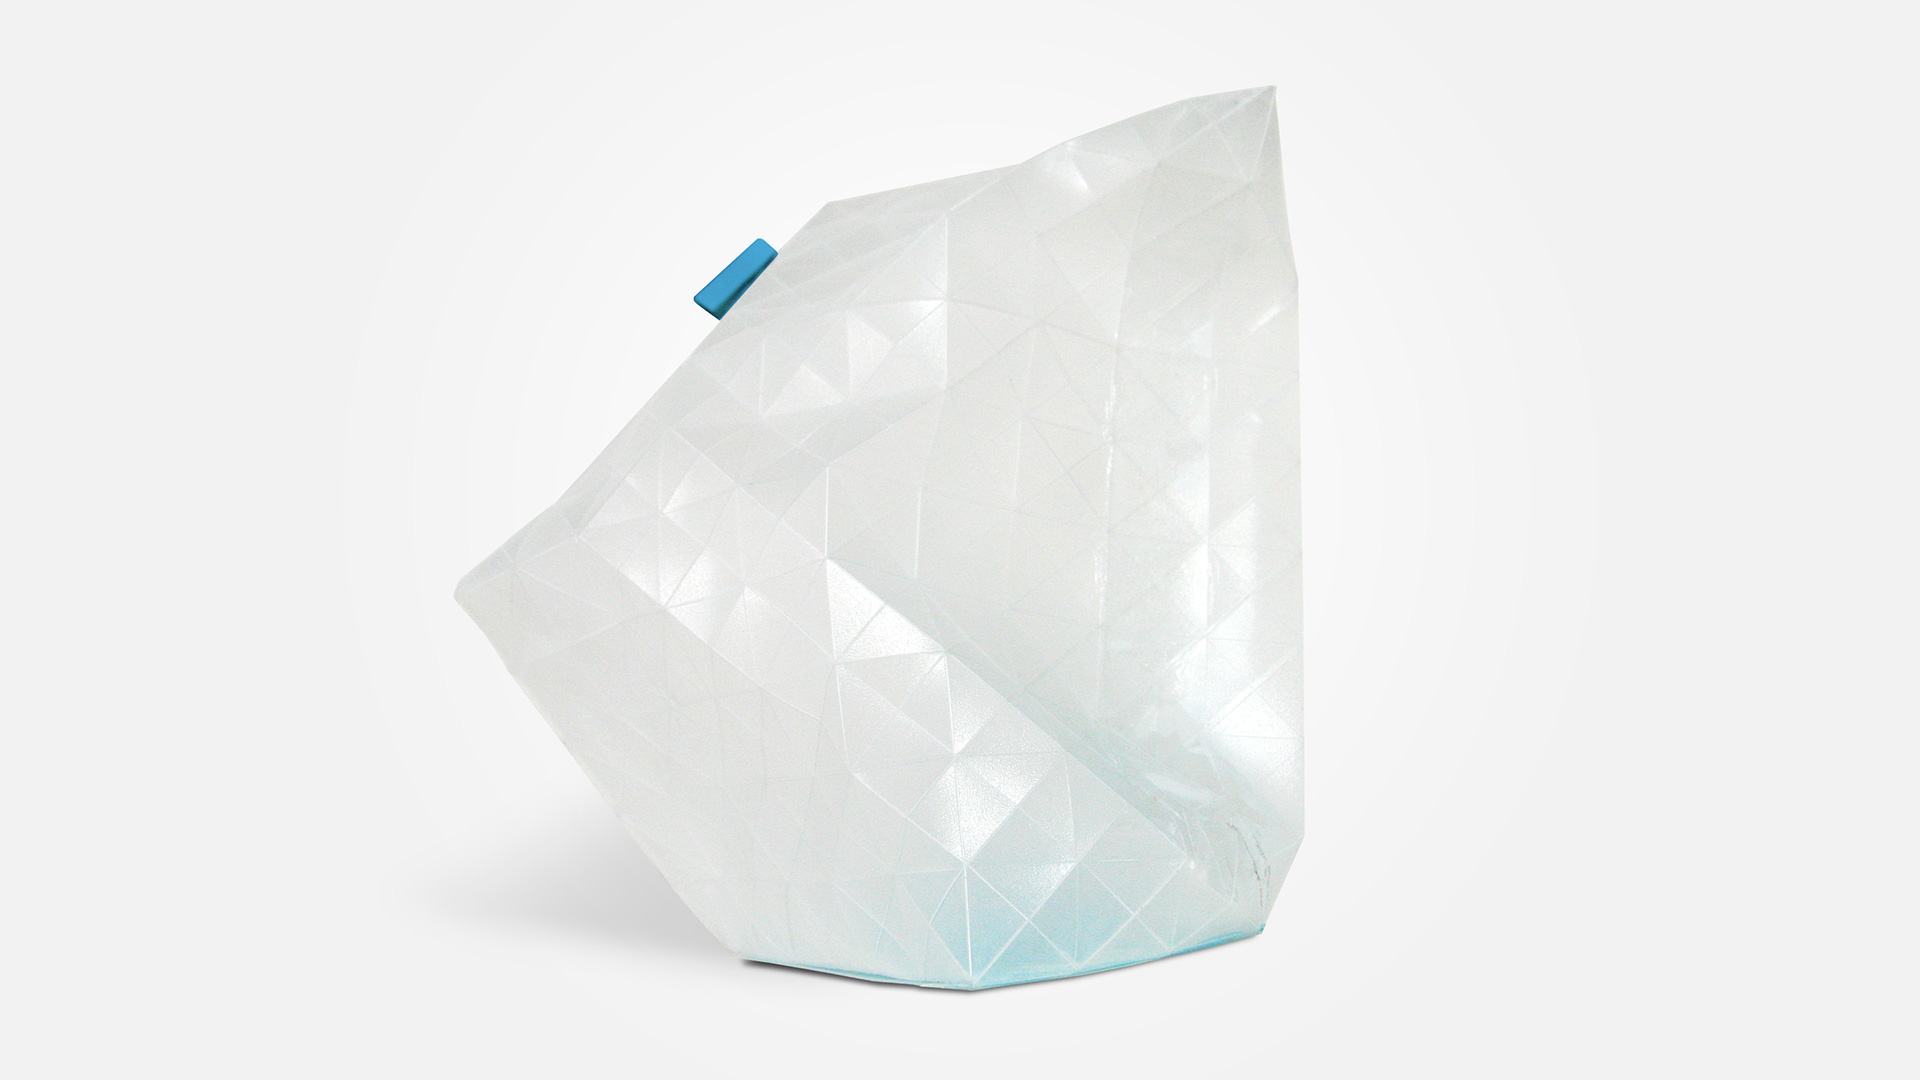 08_florian_branchet_designer_graphique_icepack_pack_back